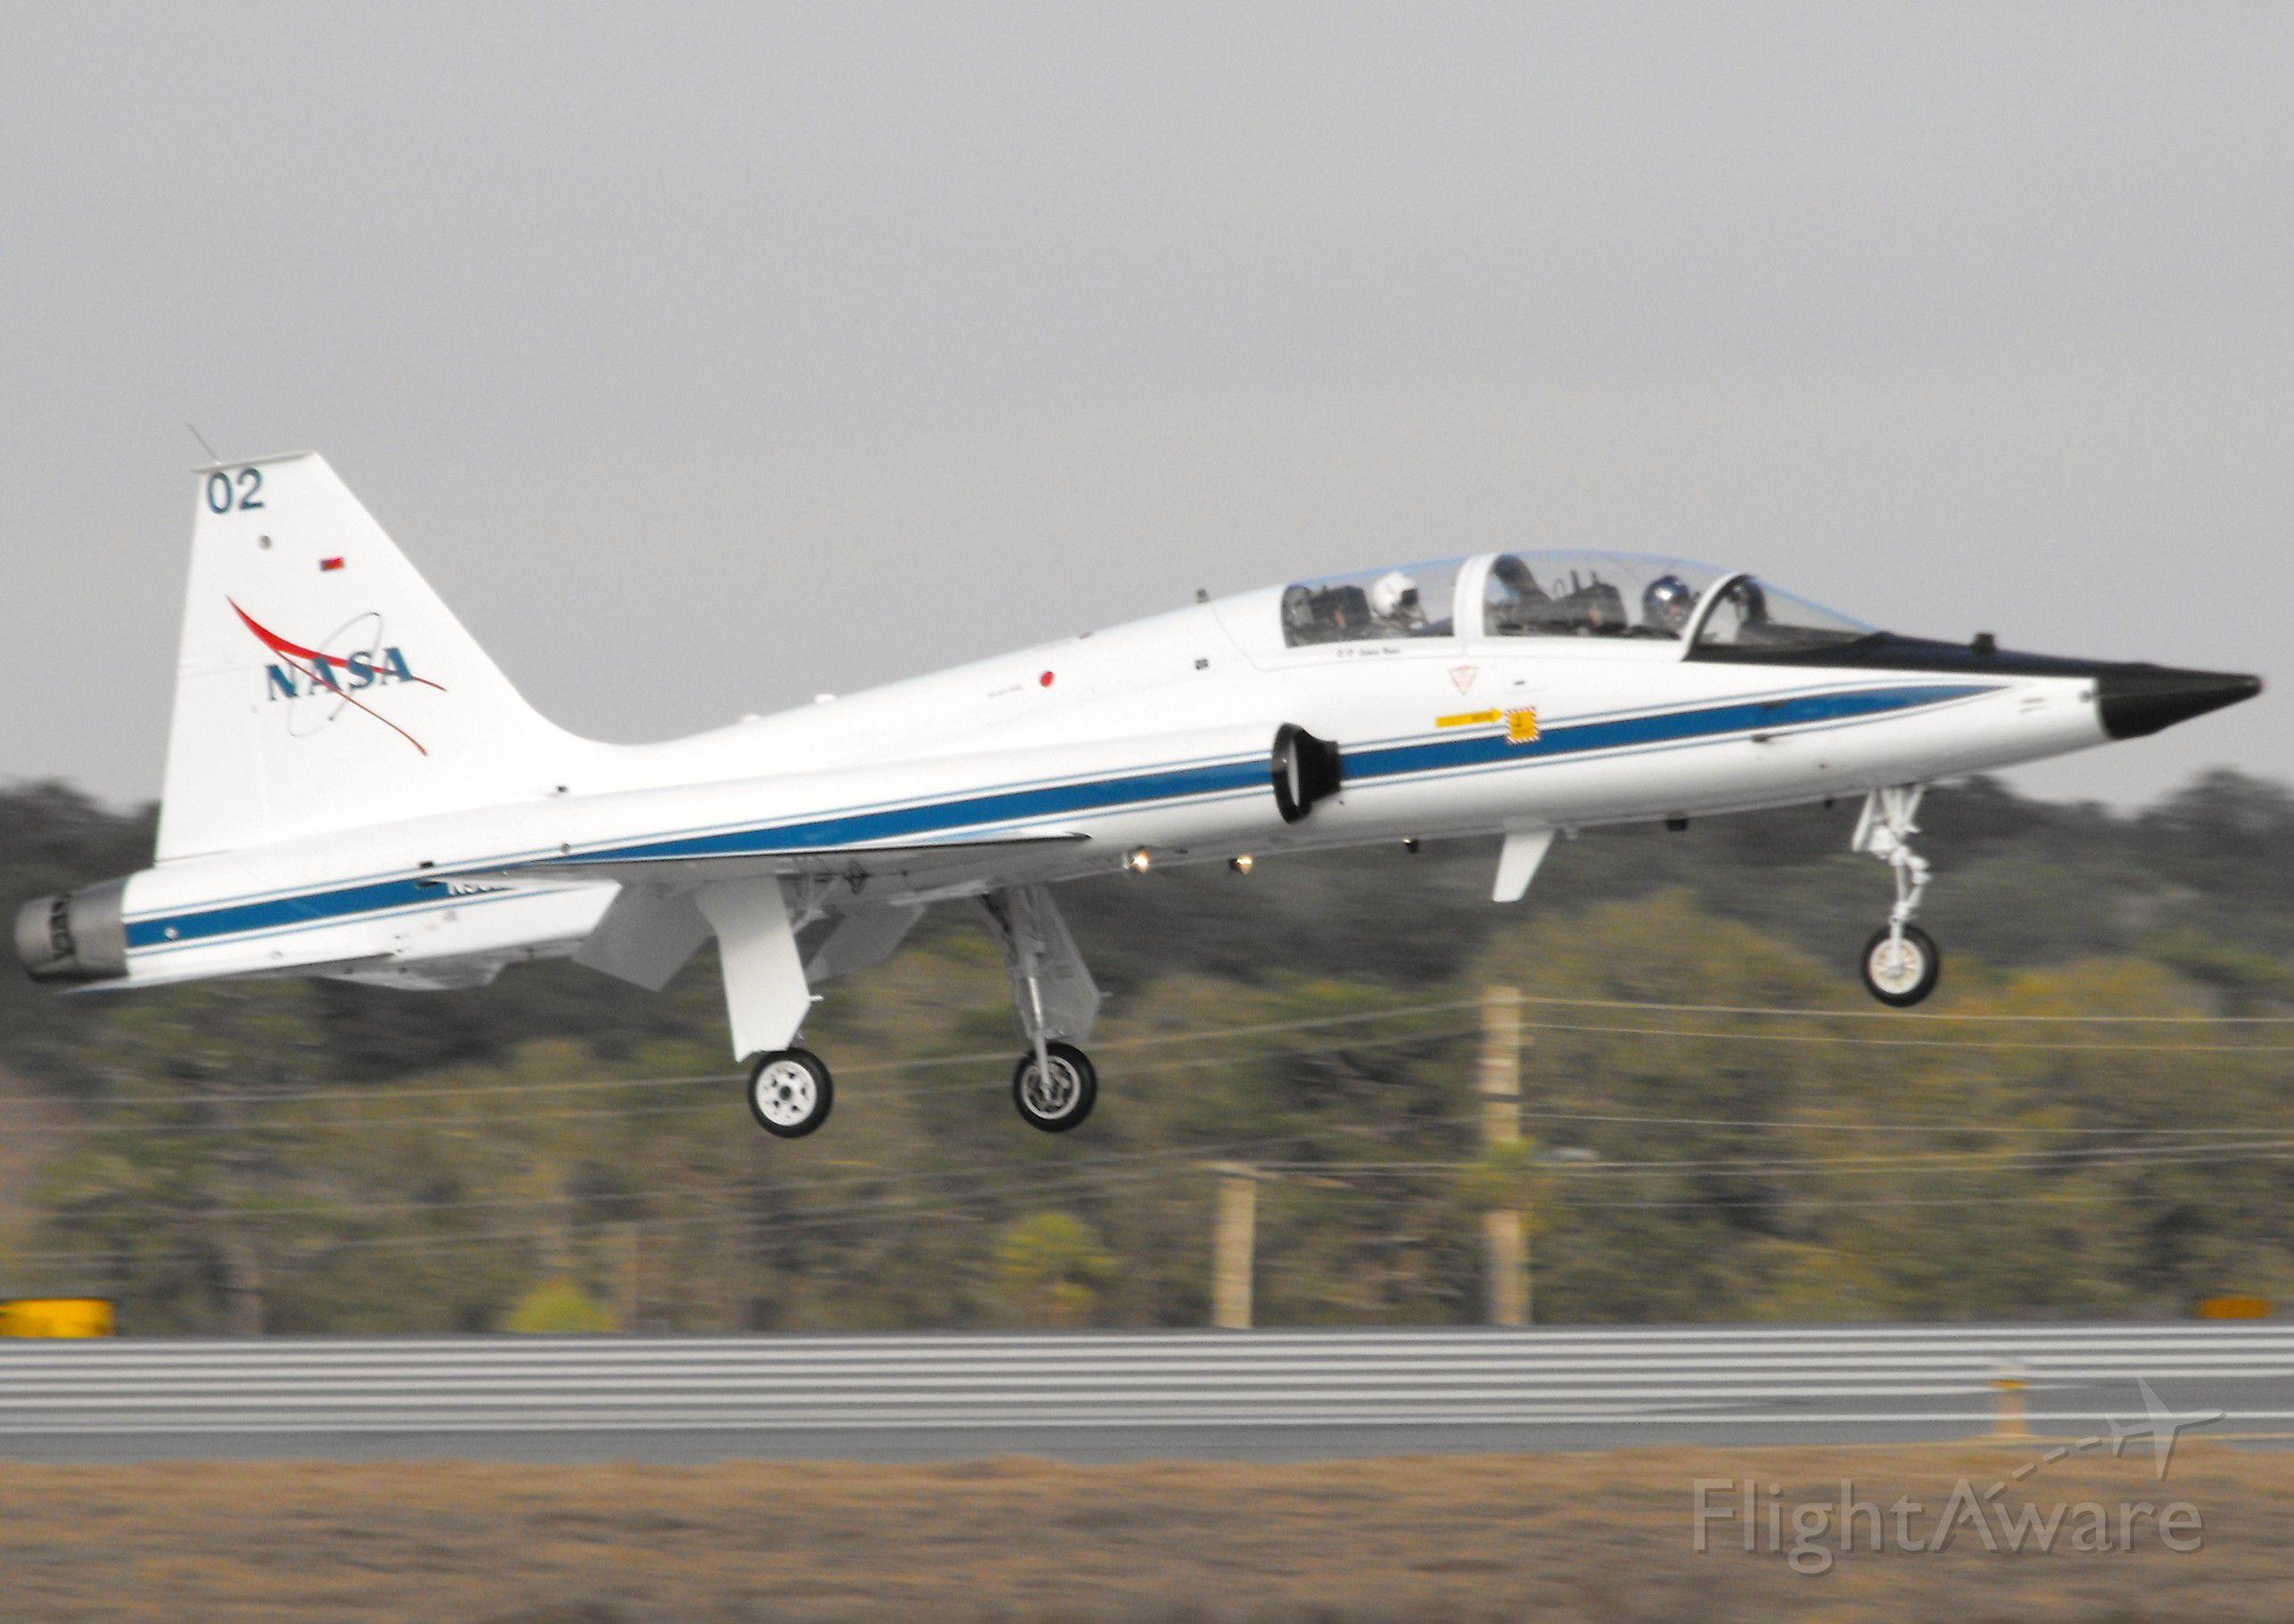 Northrop T-38 Talon (NASA902) - NASA902 landing RWY 18 in Tallahassee